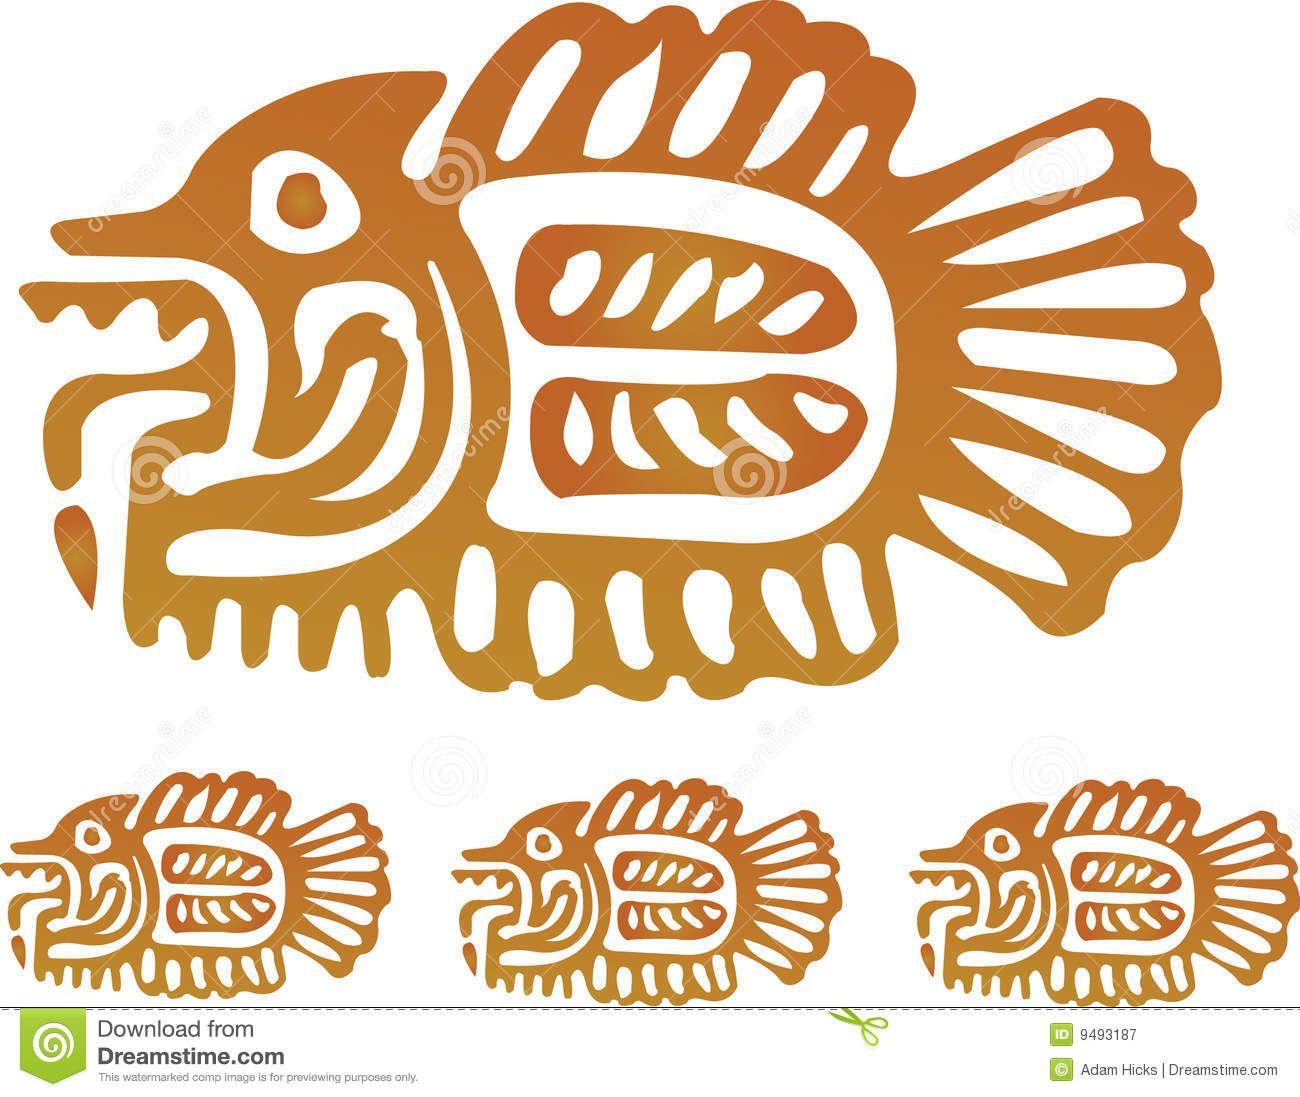 6957936381b37 Aztec Fish Royalty Free Stock Photography - Image: 9493187 Fish Design, Native  American Animals